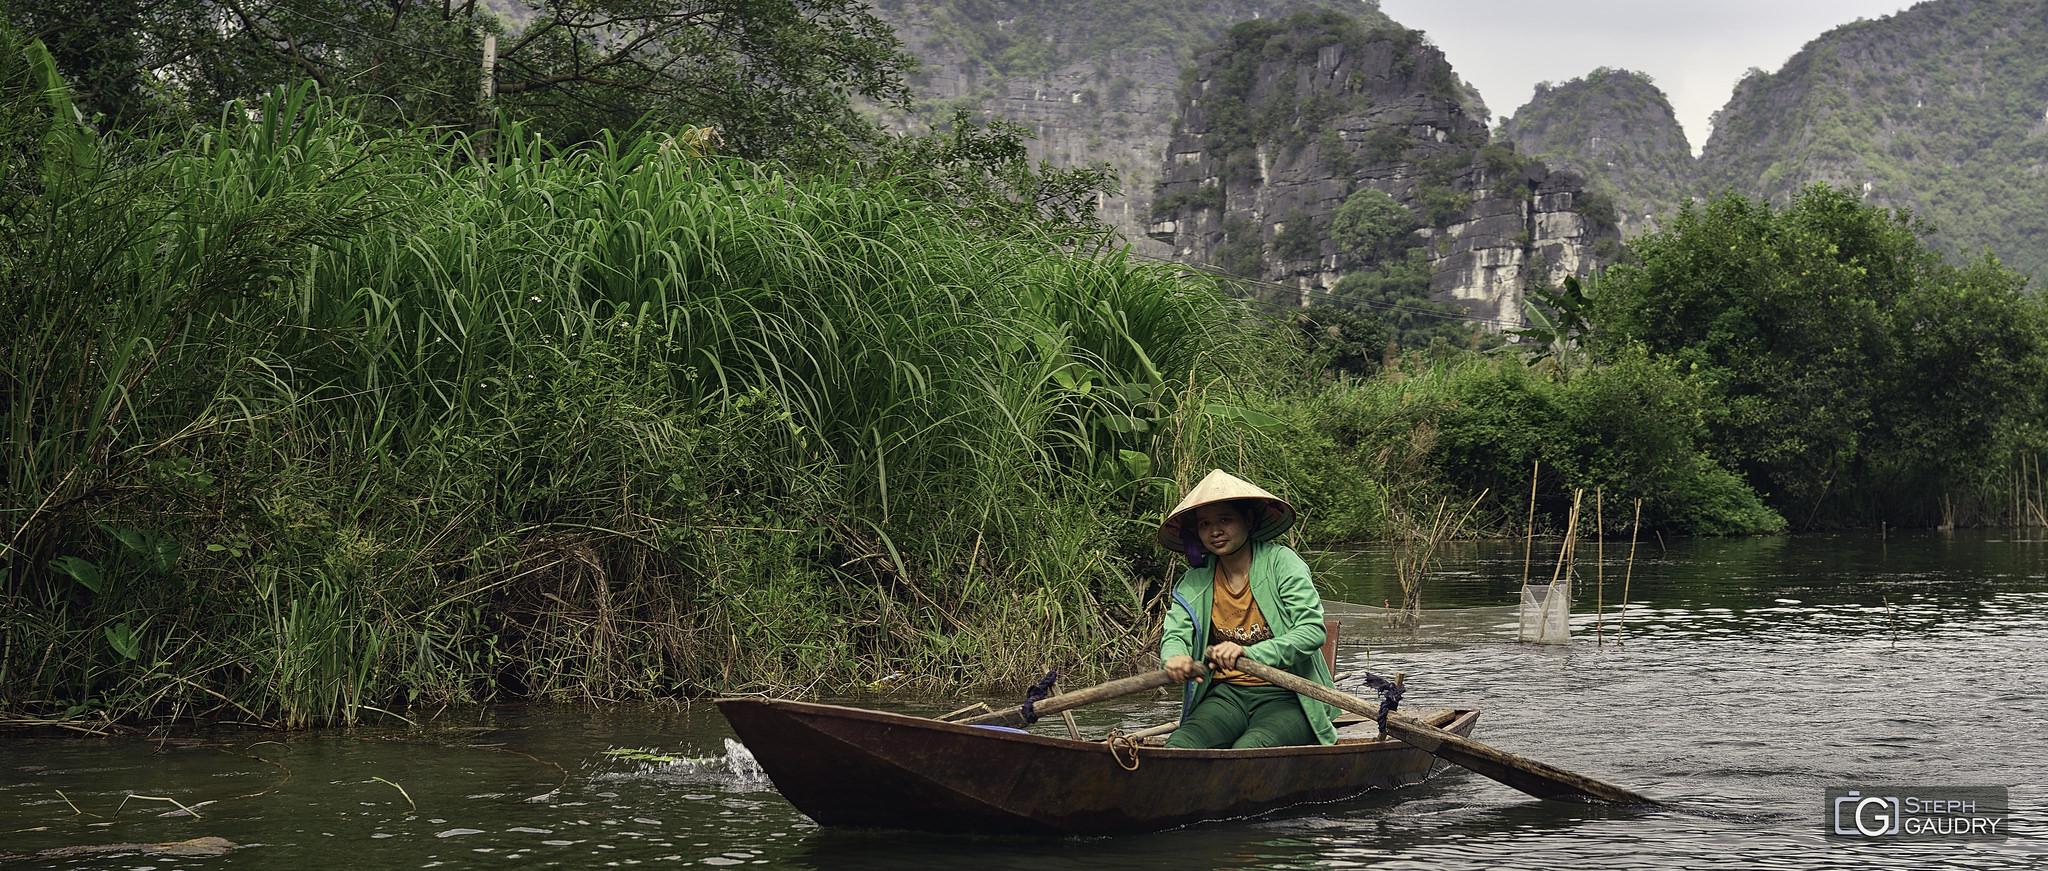 Sur la rivière Ngo Dong (Ninh Binh, Vietnam) [Click to start slideshow]